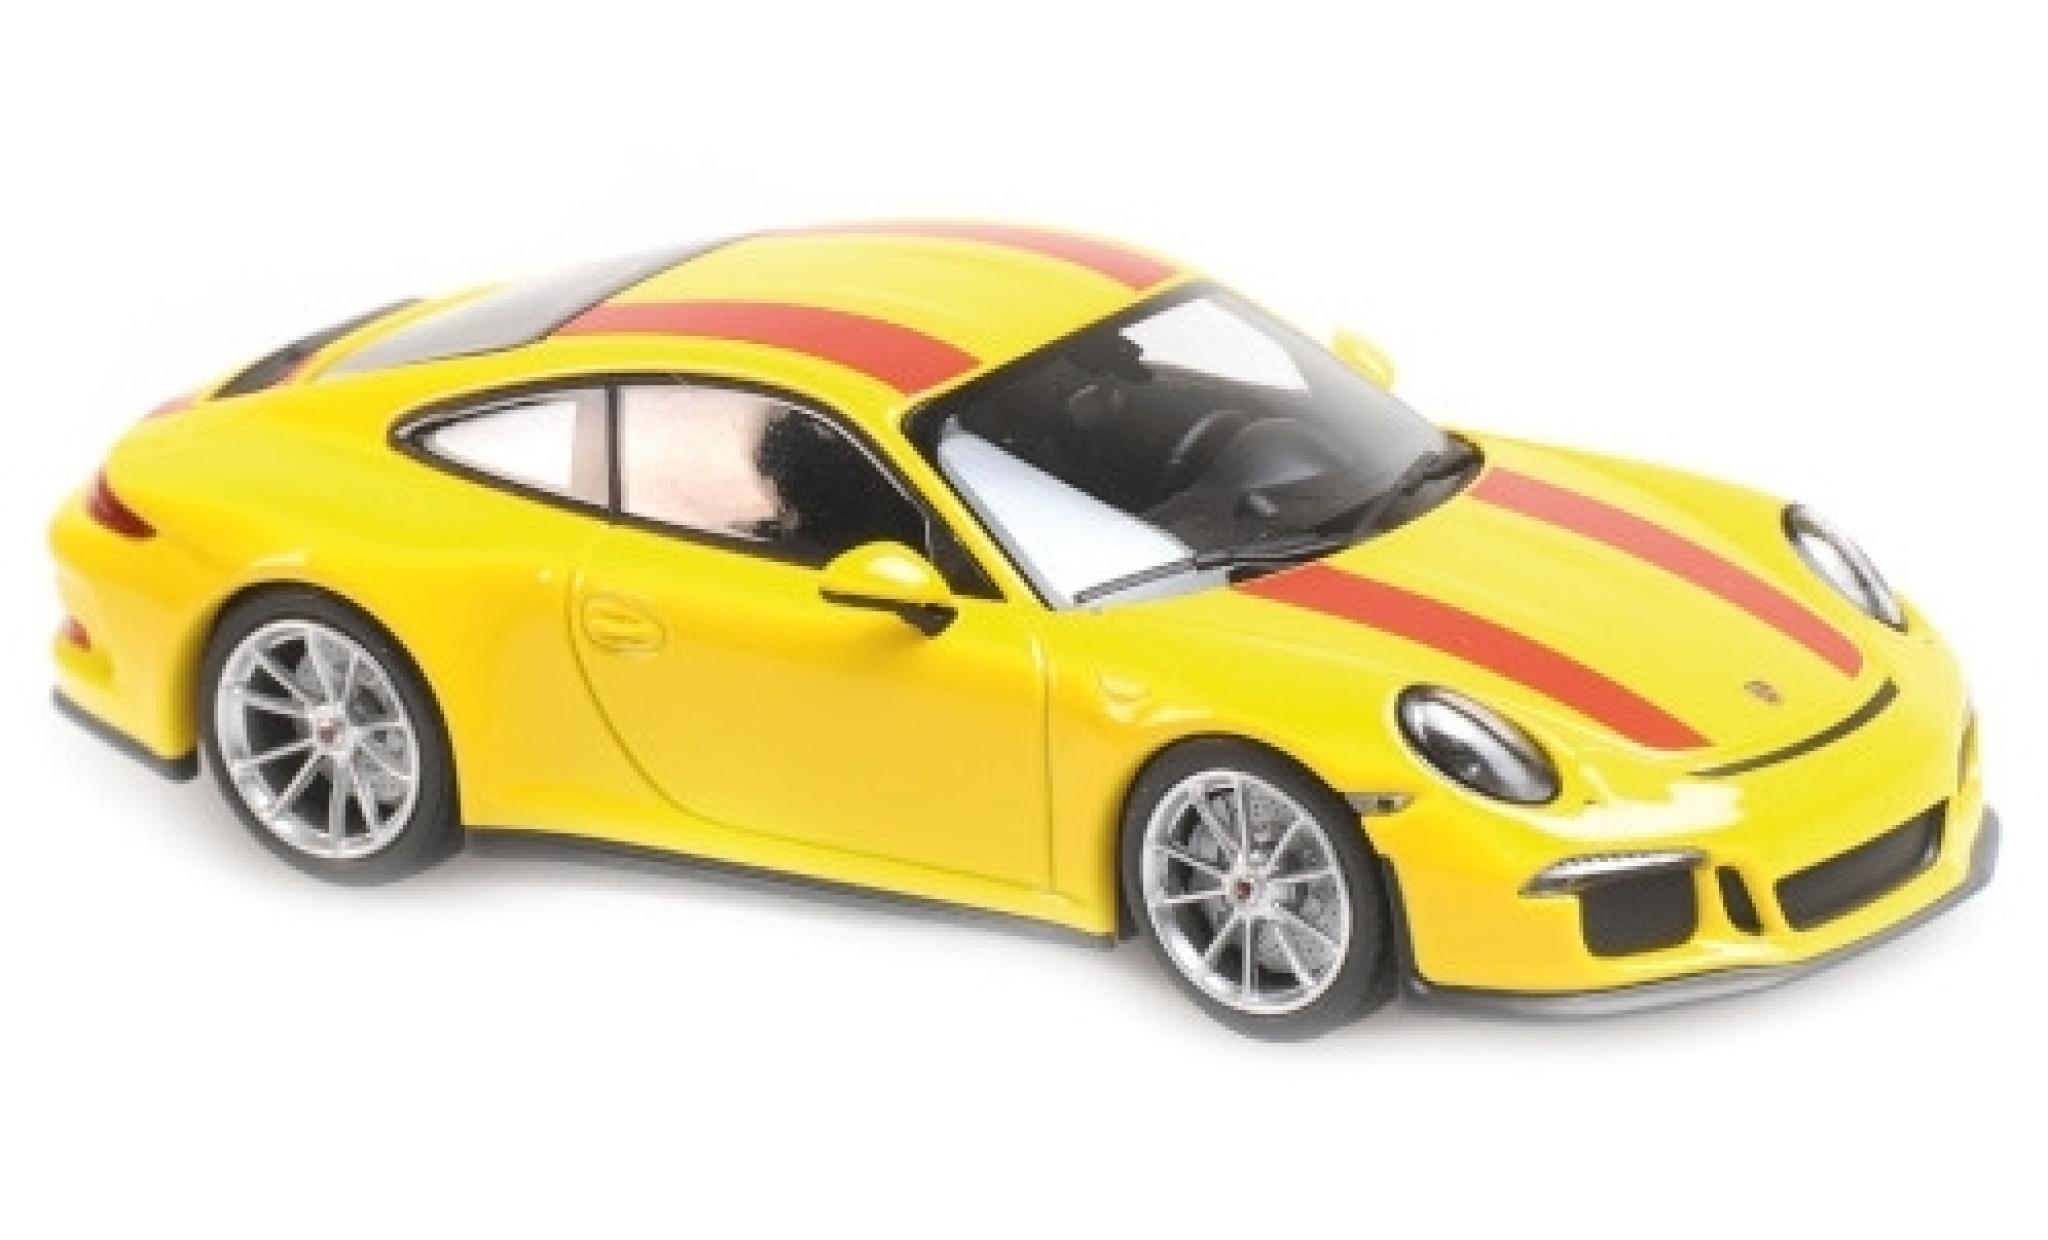 Porsche 991 R 1/43 Maxichamps 911  yellow/red 2016